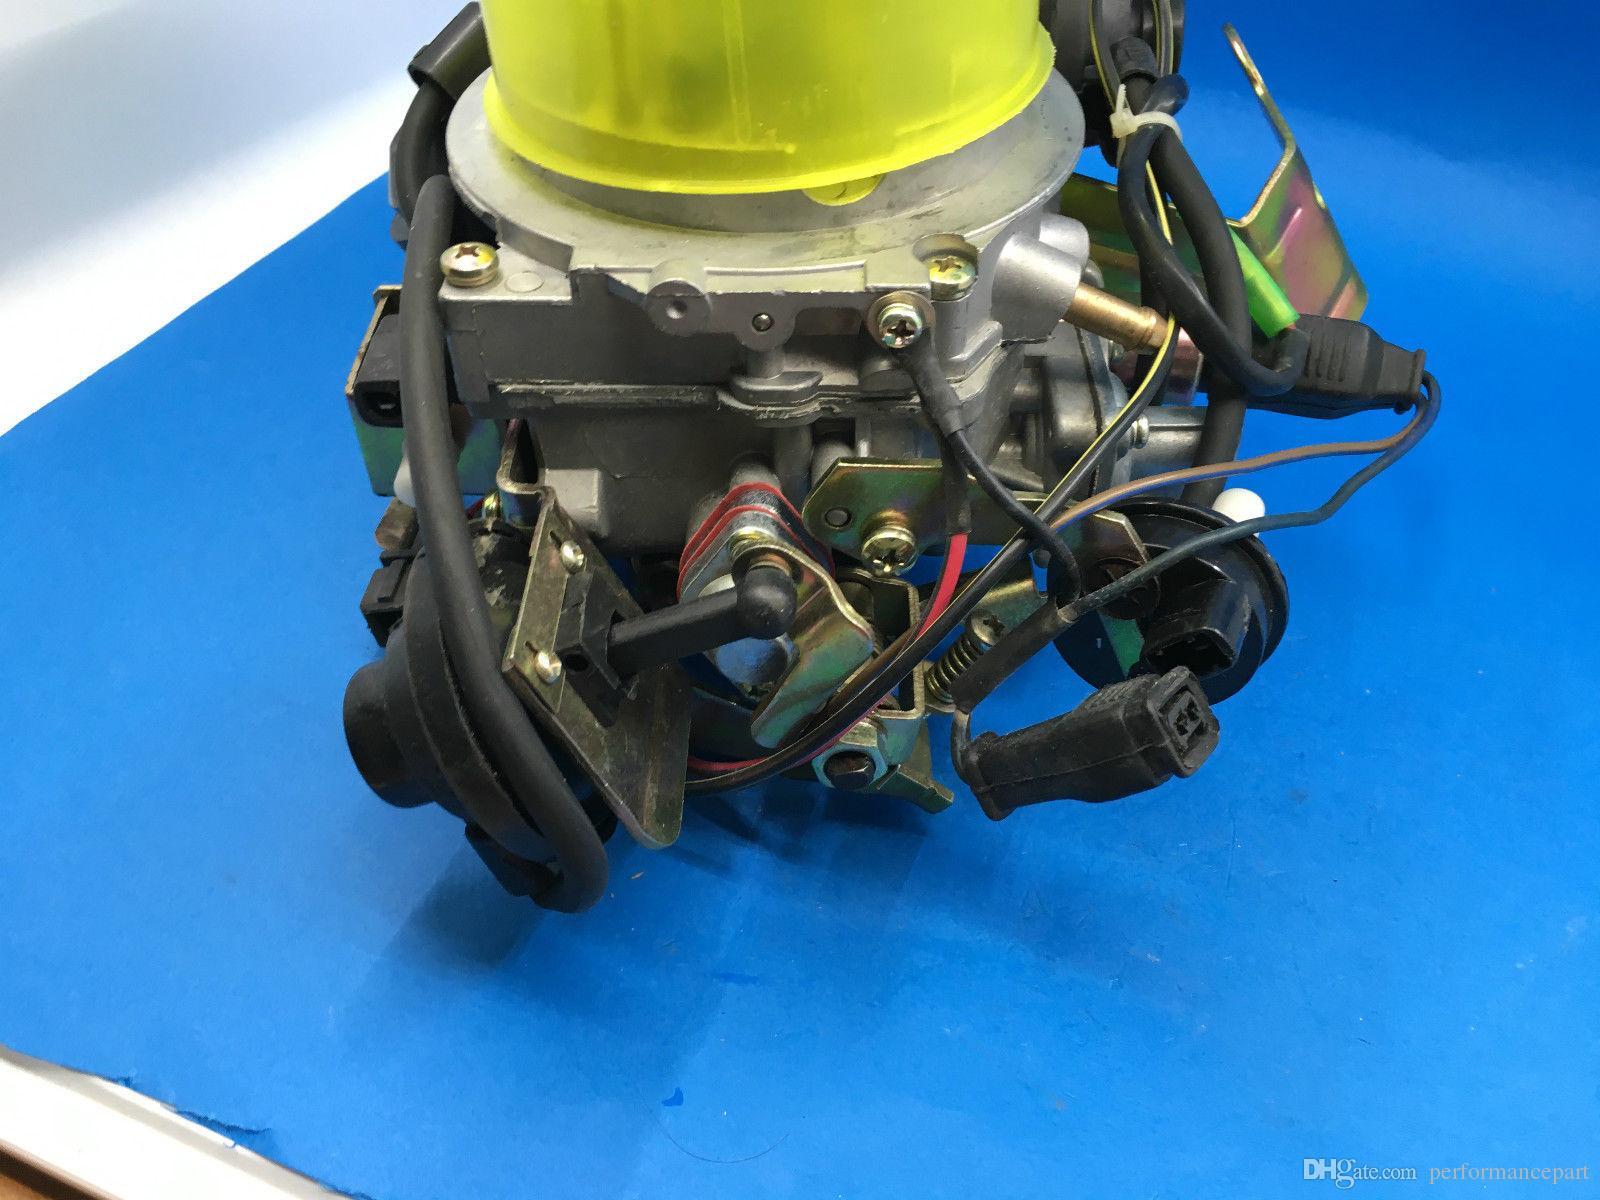 hight resolution of 2019 carb carby oem carburettor vw golf mk2 pierburg 2e2 carburetor volkswagen audi from performancepart 118 59 dhgate com